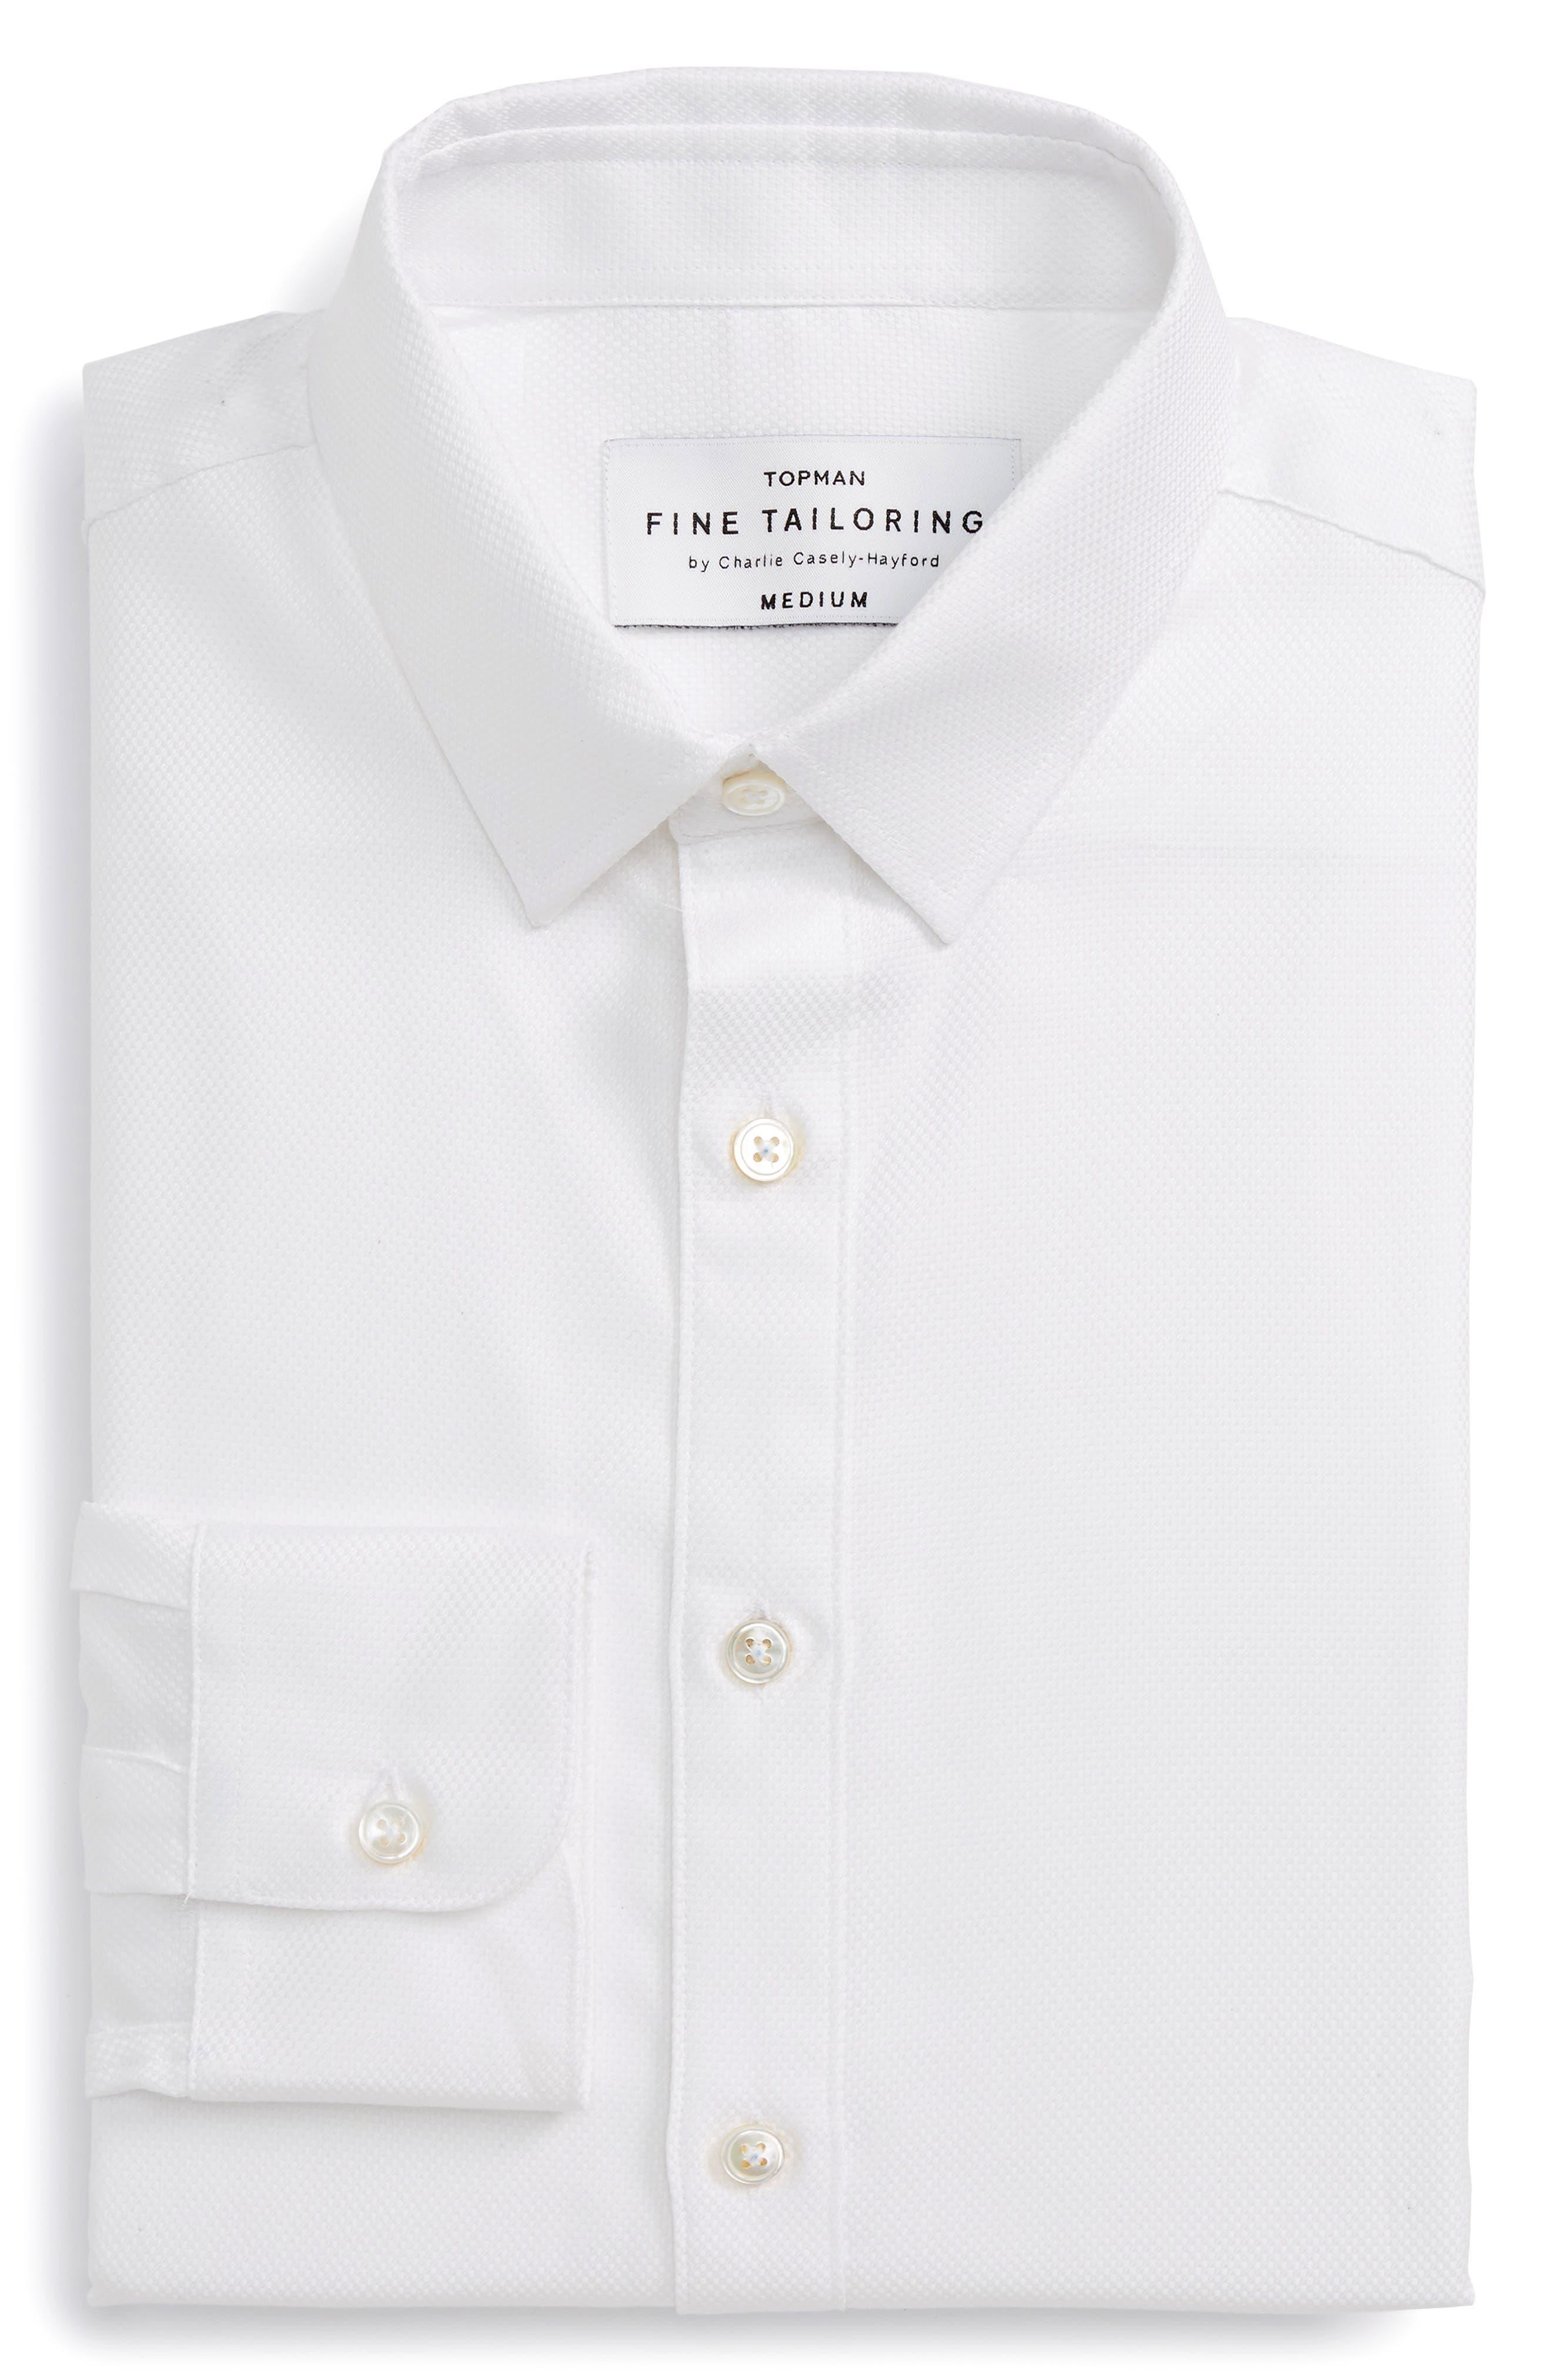 Charlie Casely-Hayford x Topman Skinny Fit Dress Shirt